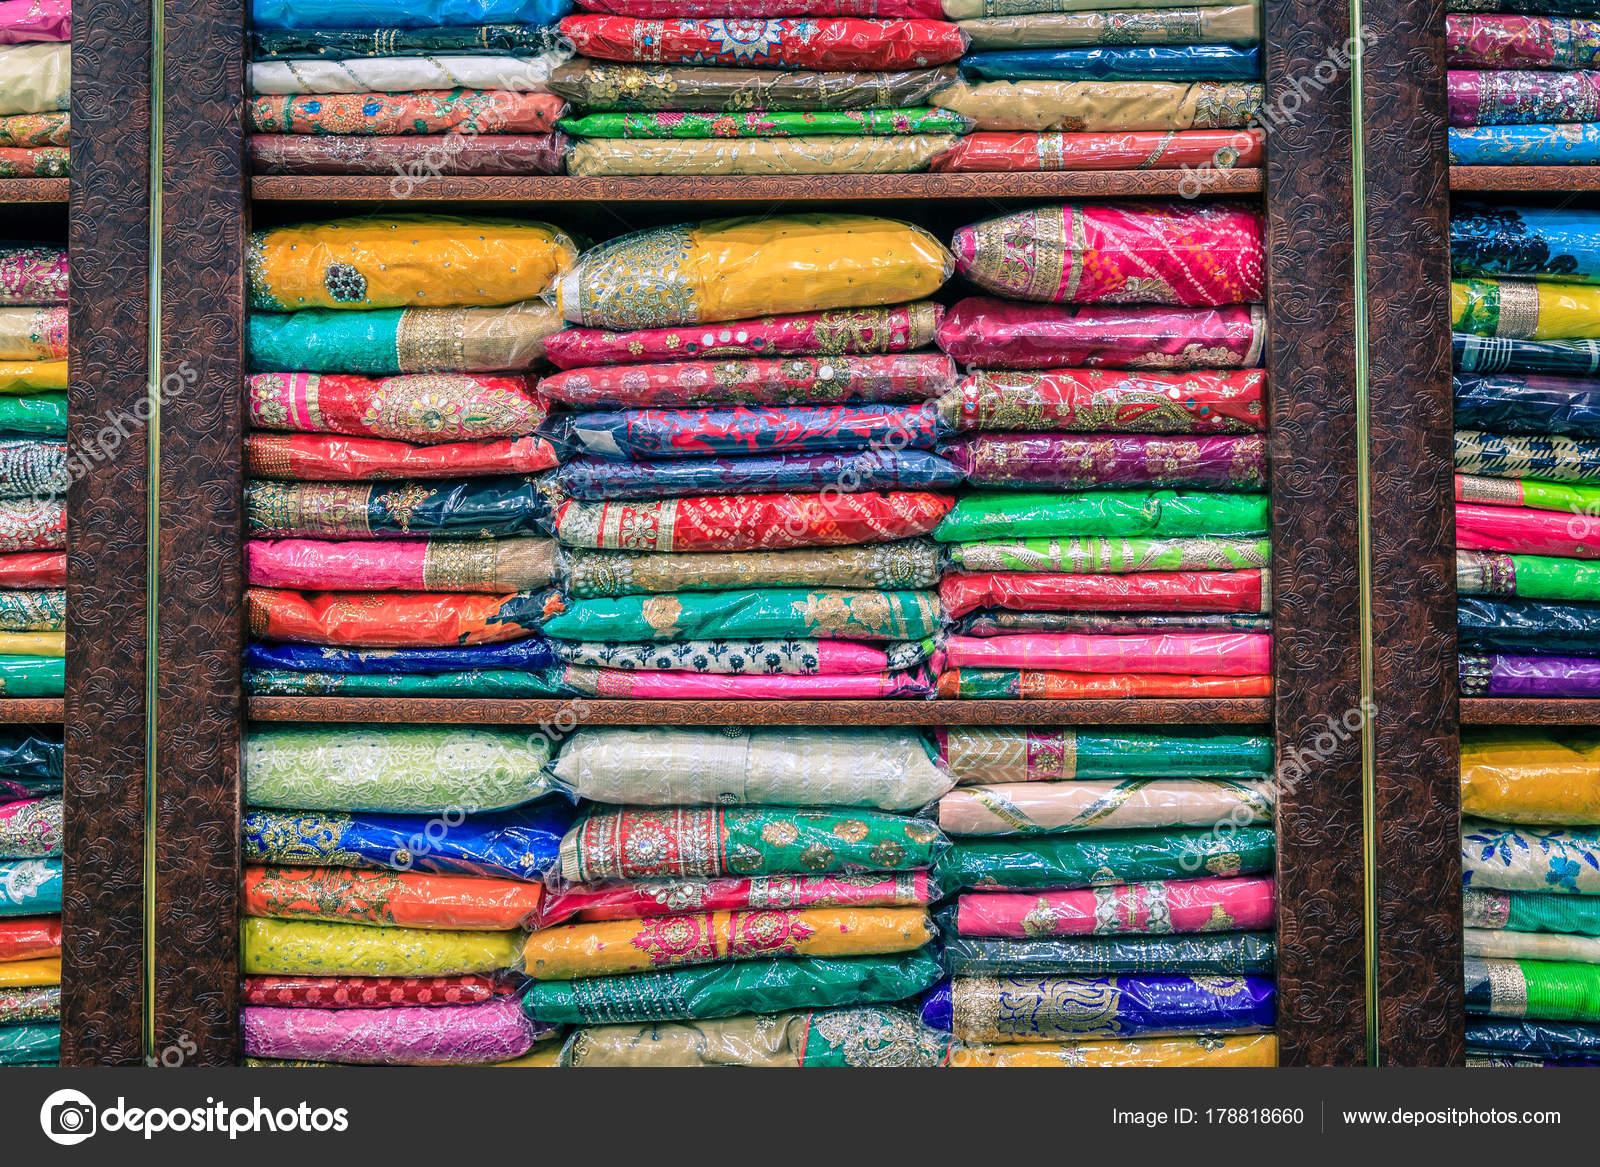 56990233d99 Πολύχρωμο Πασμίνες Ένα Ινδικό Κατάστημα Στην Παλιά Πόλη Του Ντουμπάι —  Φωτογραφία Αρχείου